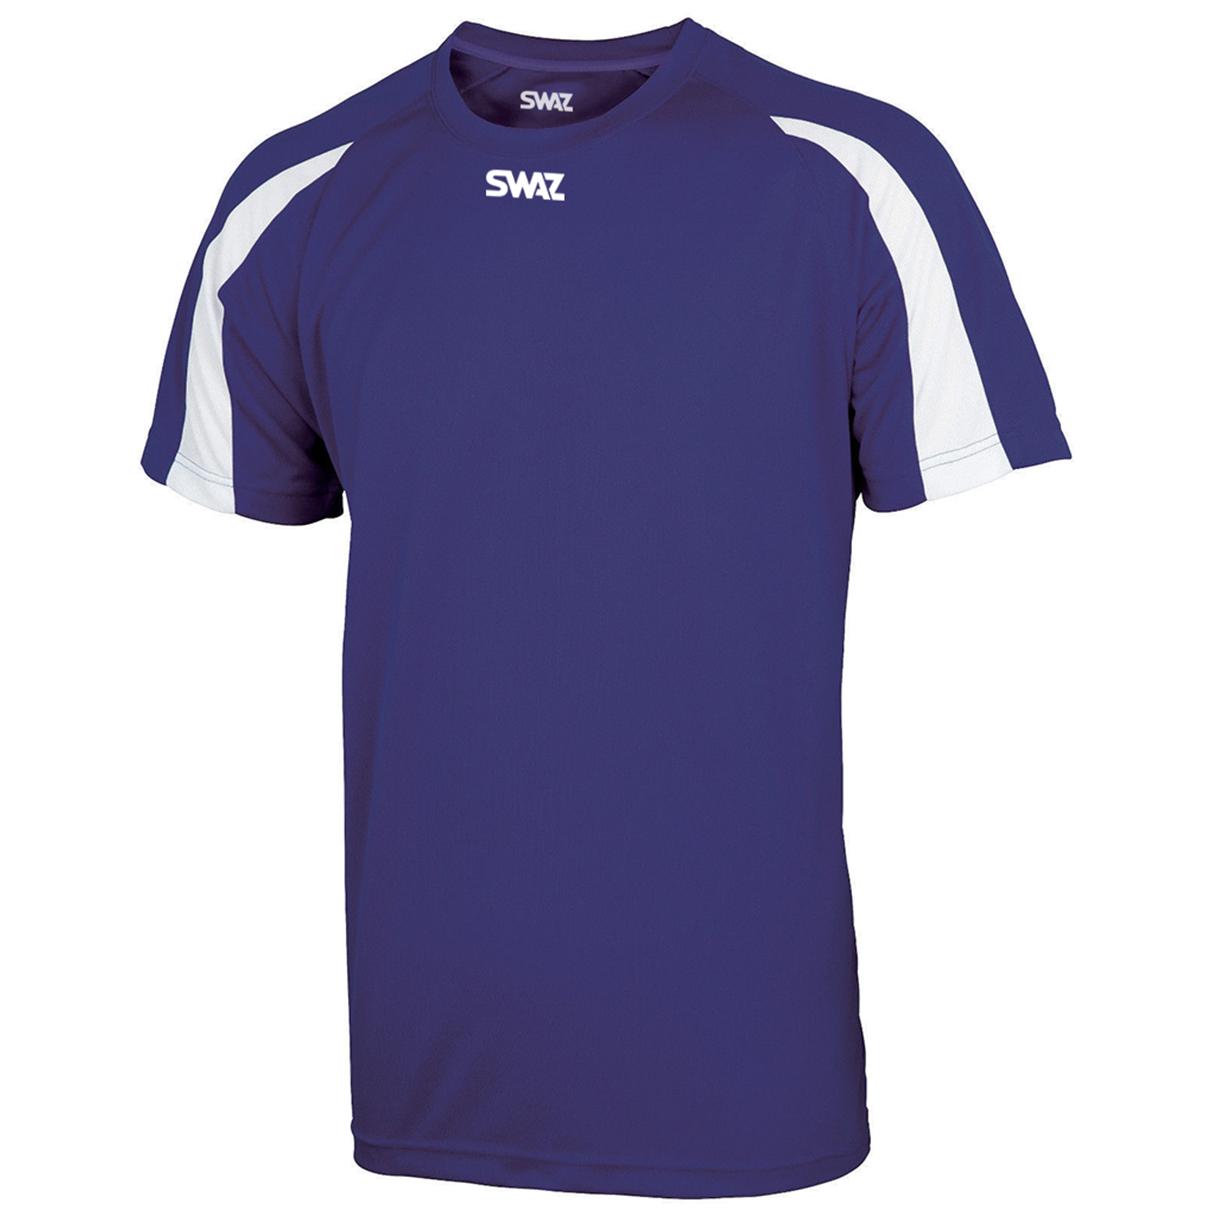 SWAZ Premier Training T-Shirt – Purple/White